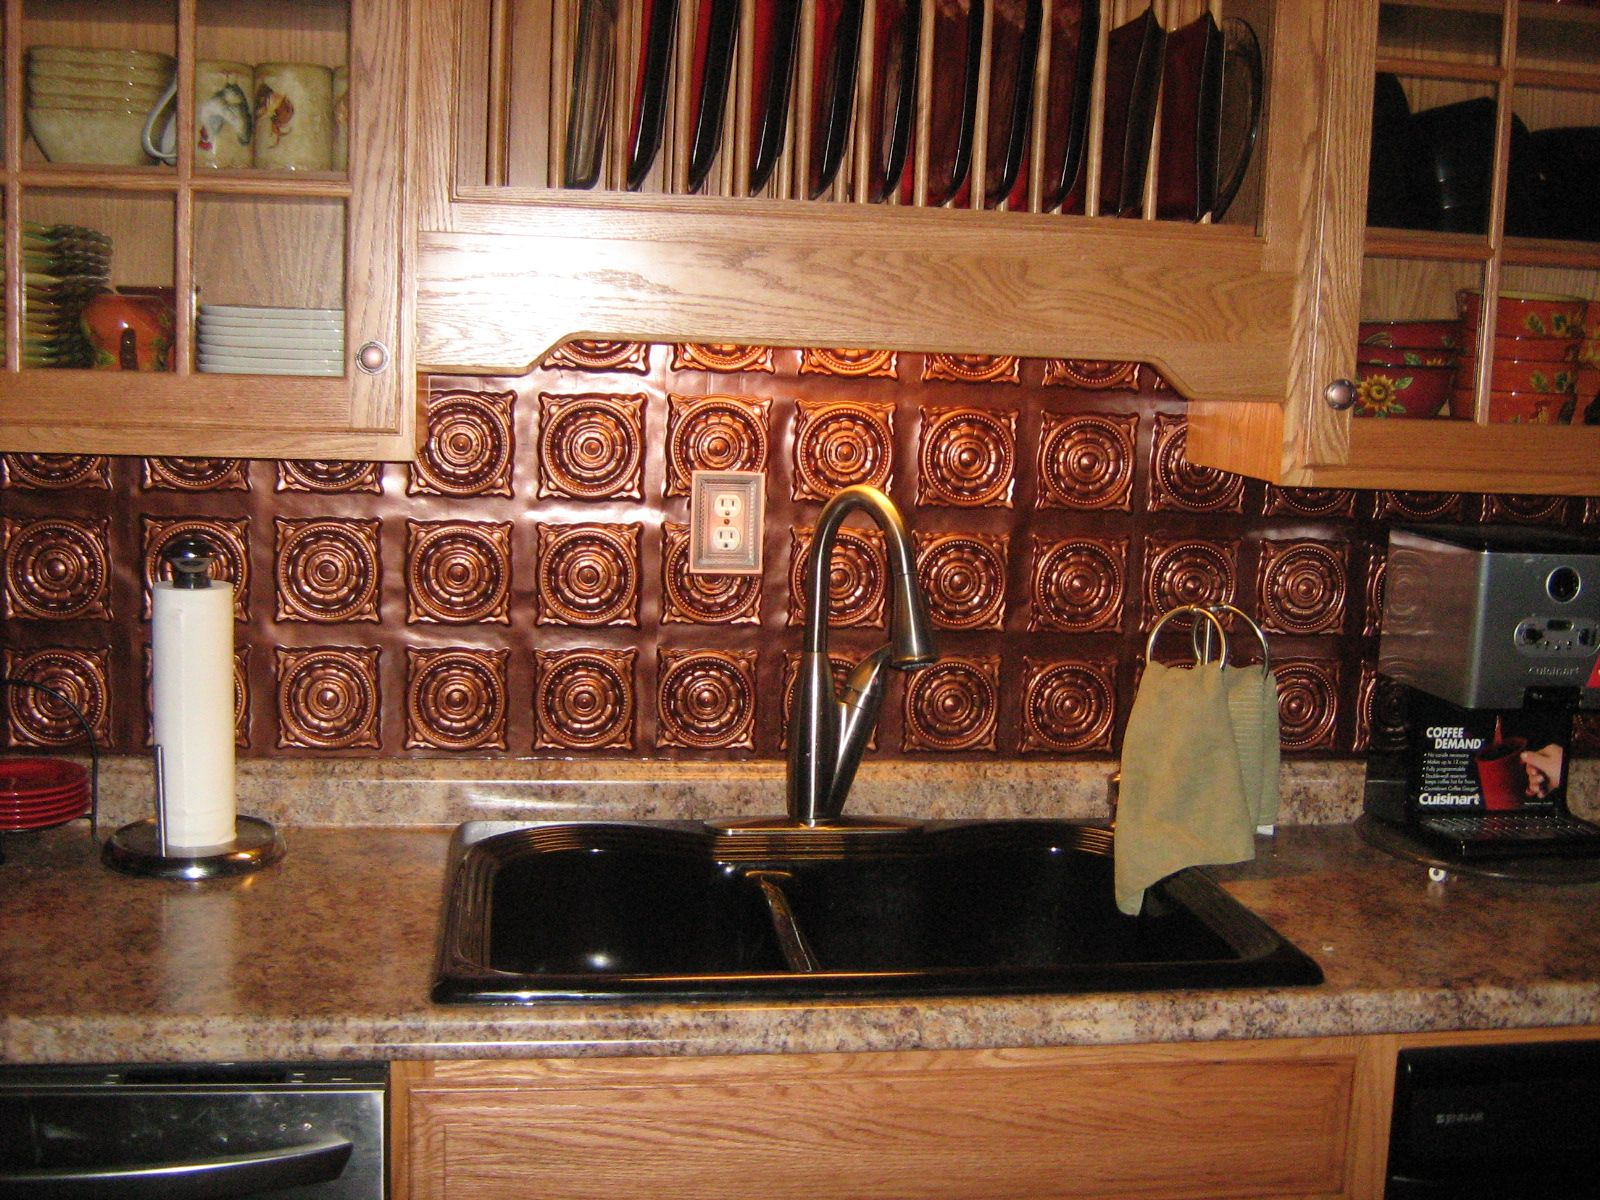 Ceiling Tiles Kitchen Back Splash Decorative Ceiling Tiles